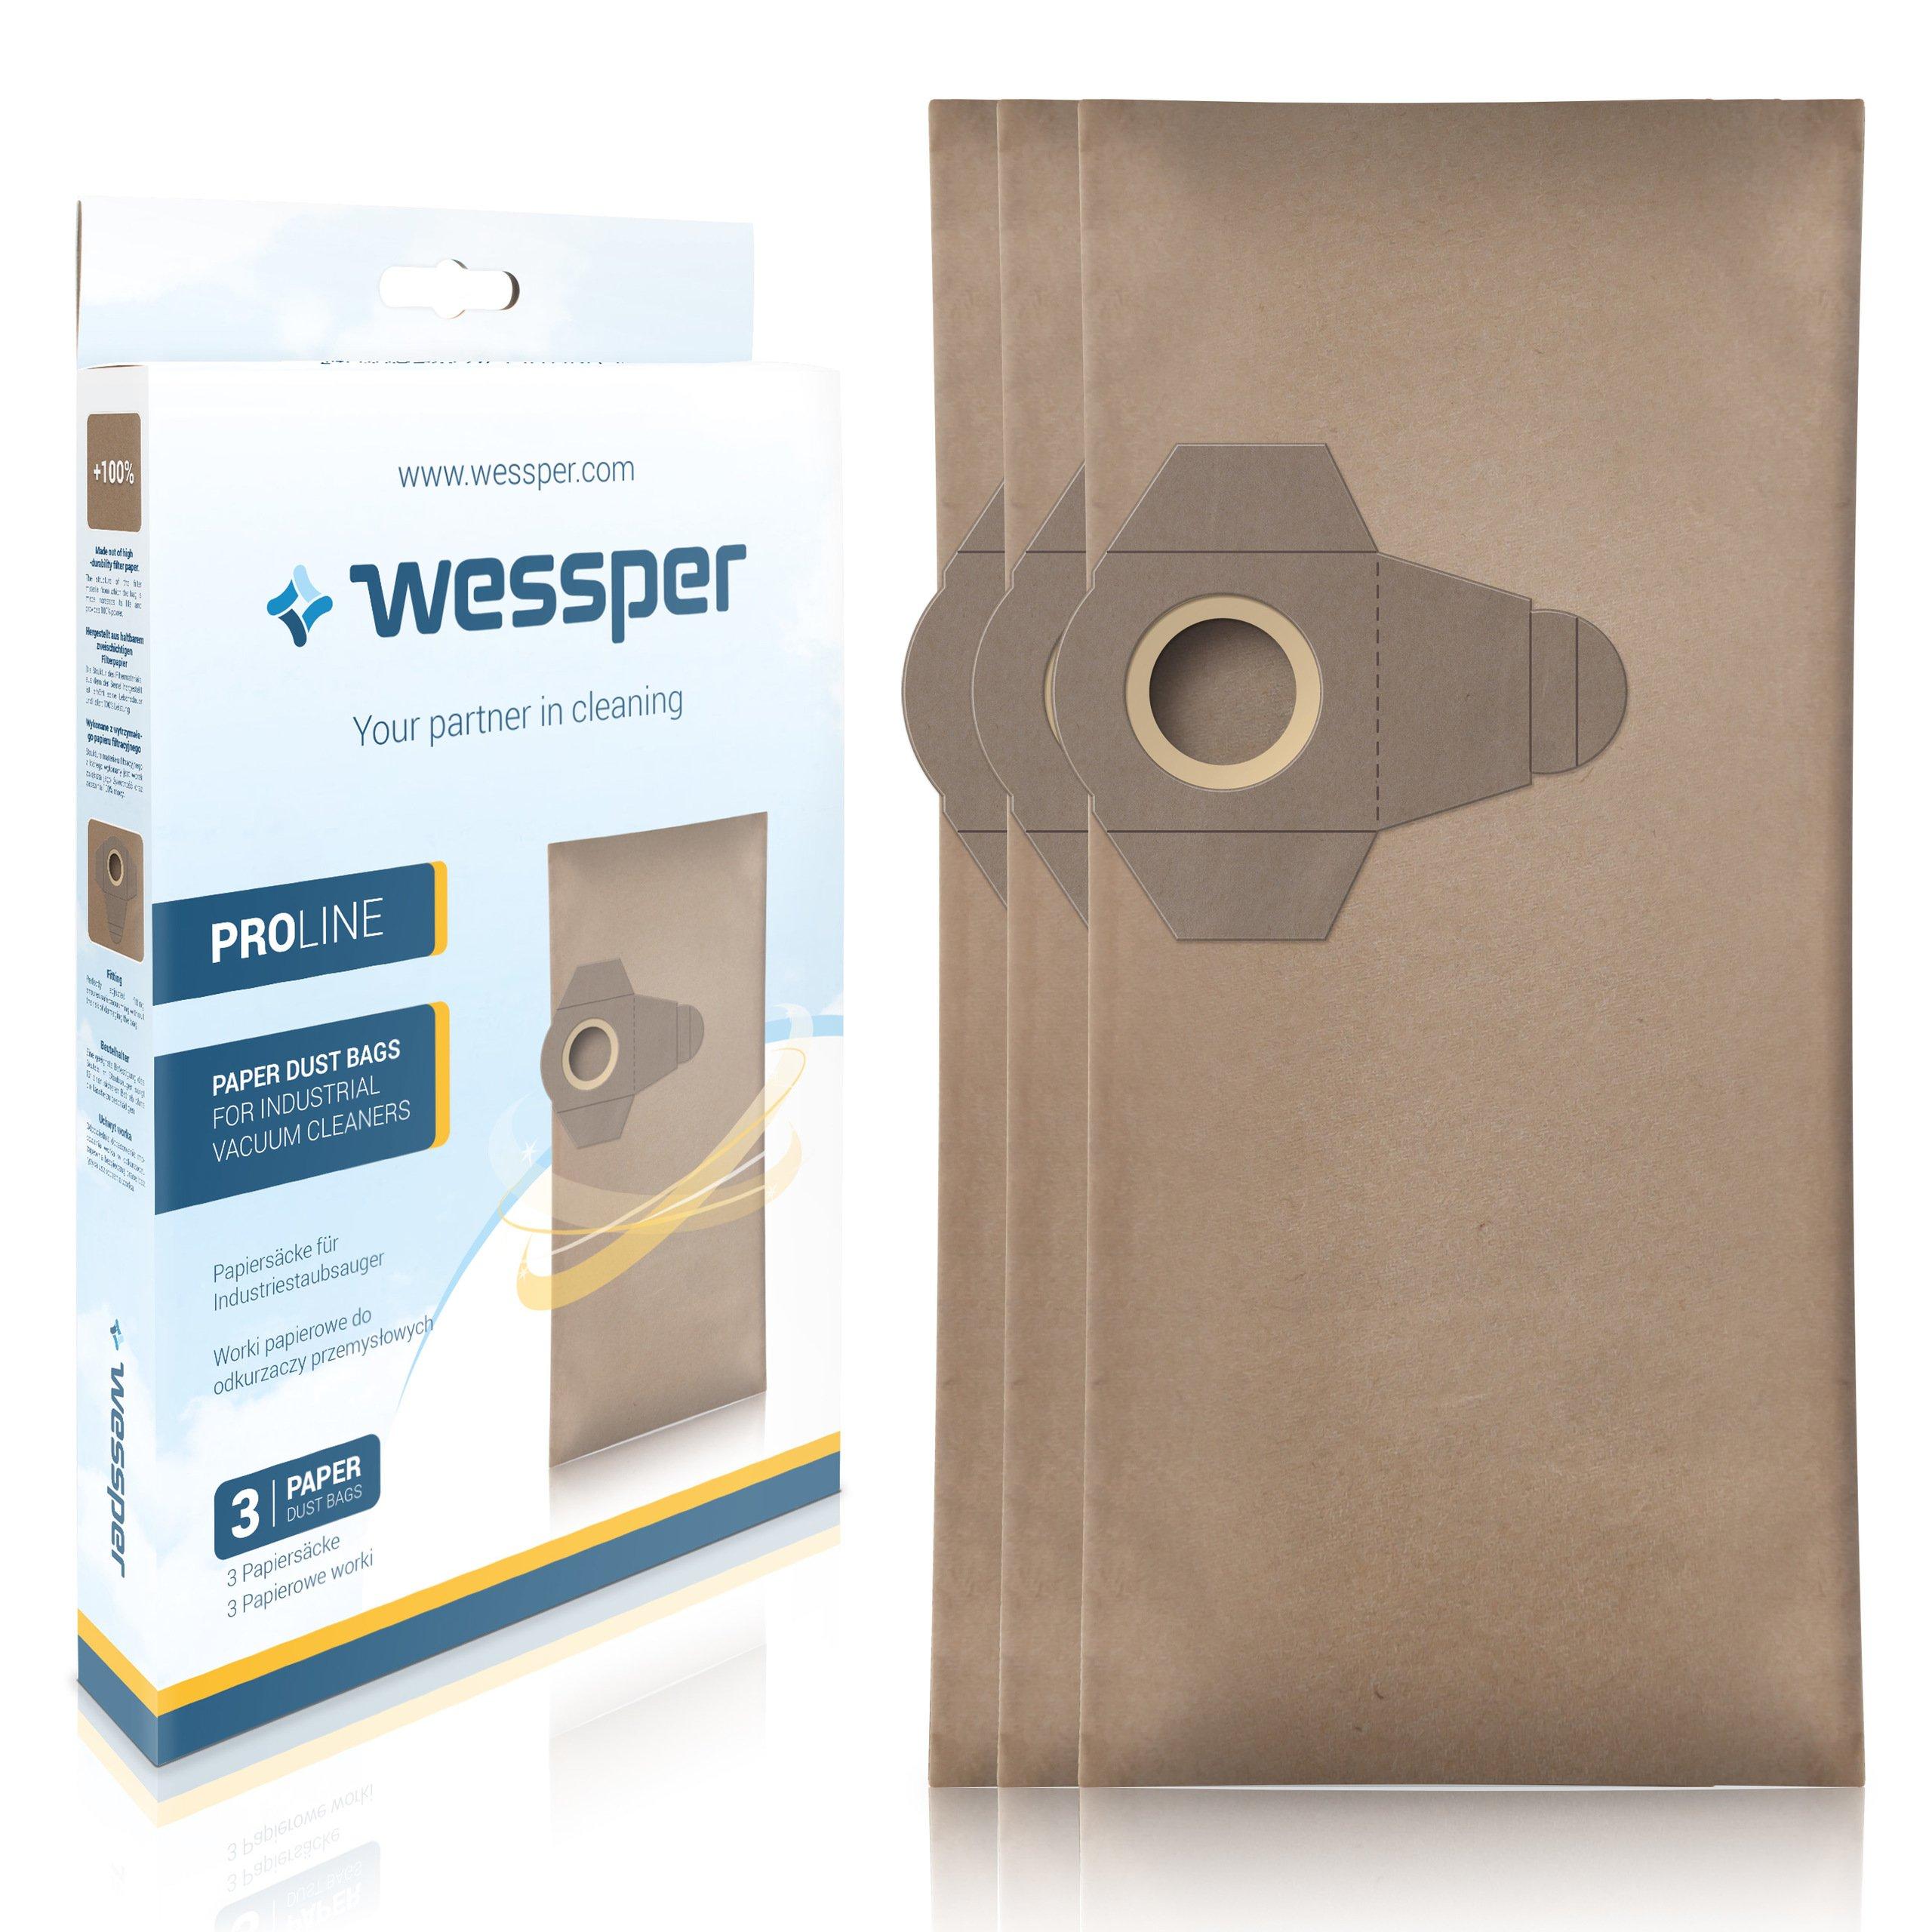 Wessper Bolsas de aspiradora para LIDL Parkside PNTS 1400 B2 (3 Piezas, Papel): Amazon.es: Hogar